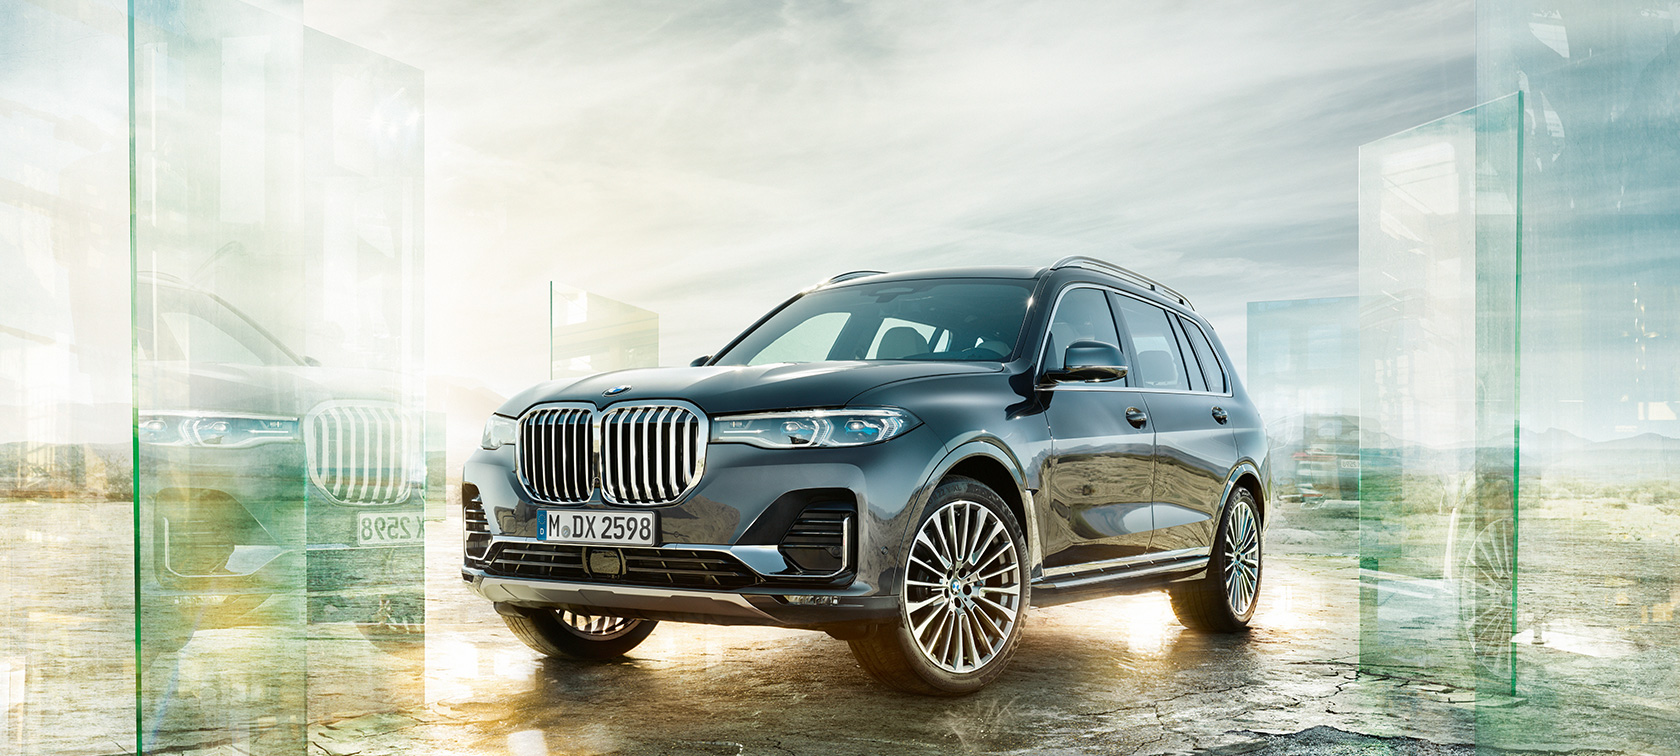 BMW X7 xDrive40i الجديدة 2020